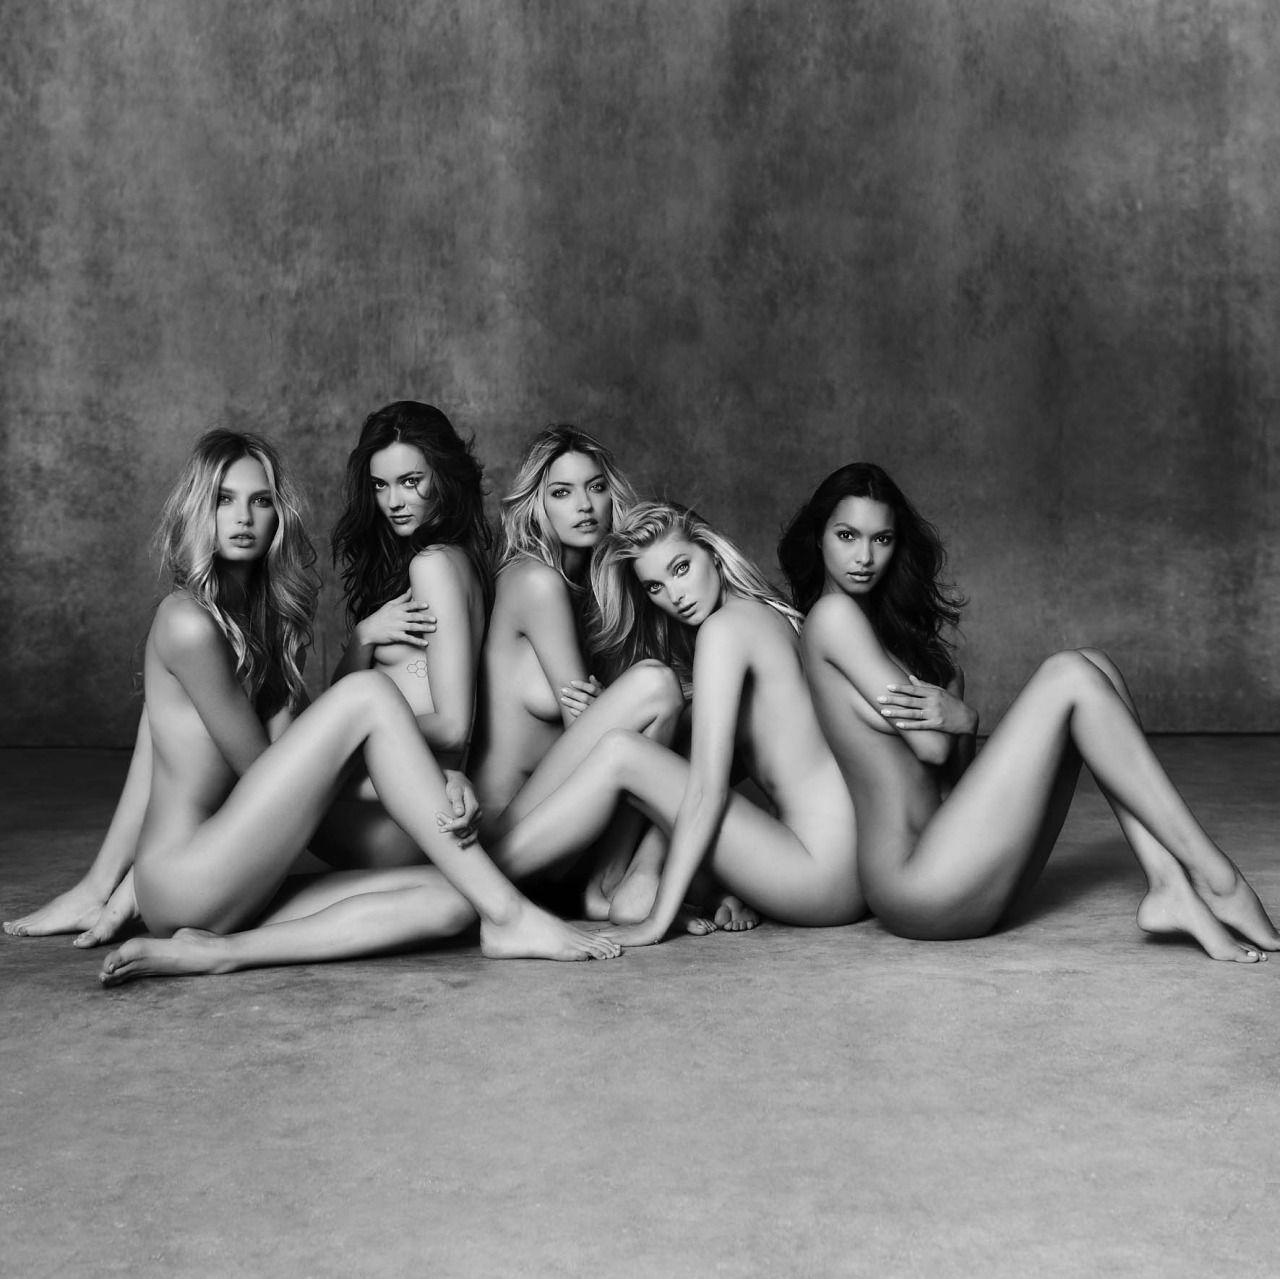 Art nude models